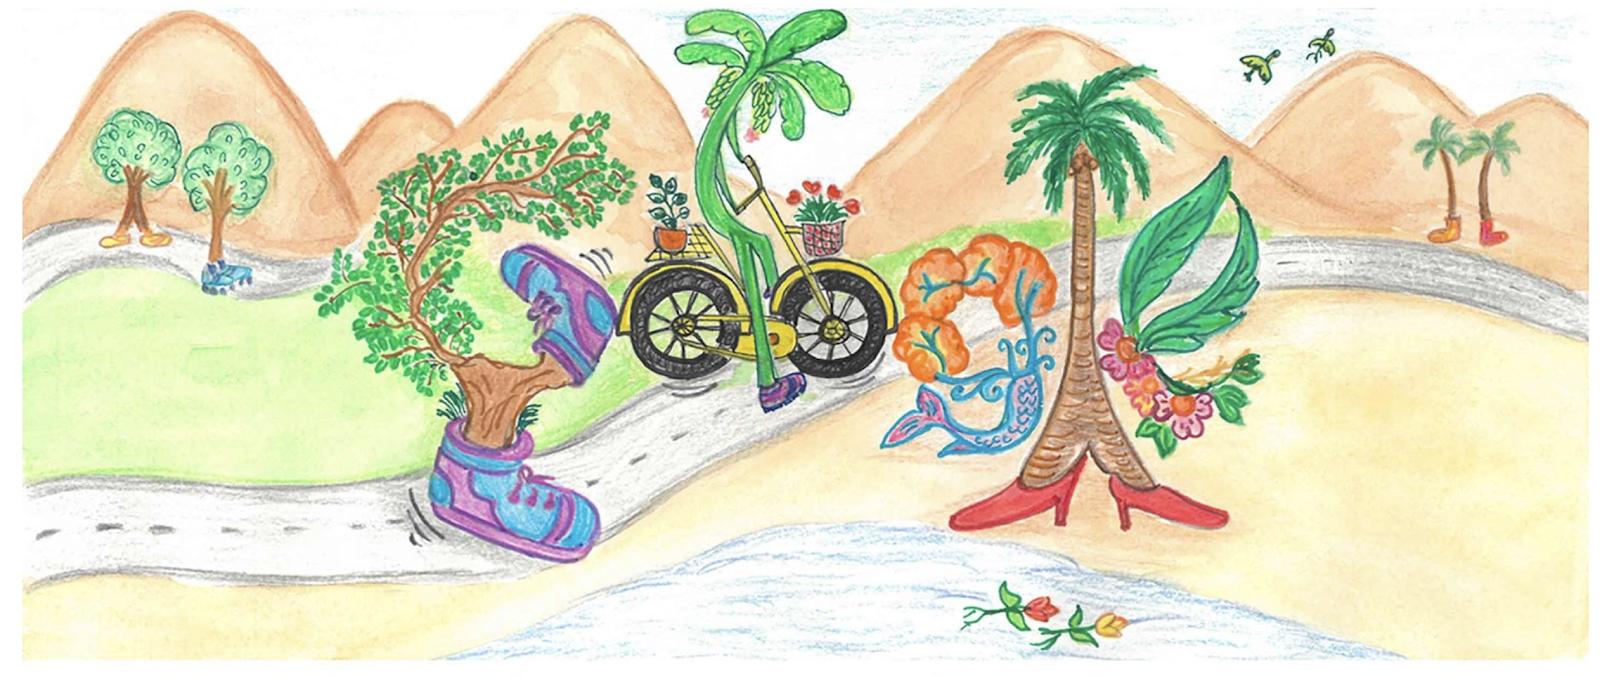 Doodle For Google 2019 India Winner